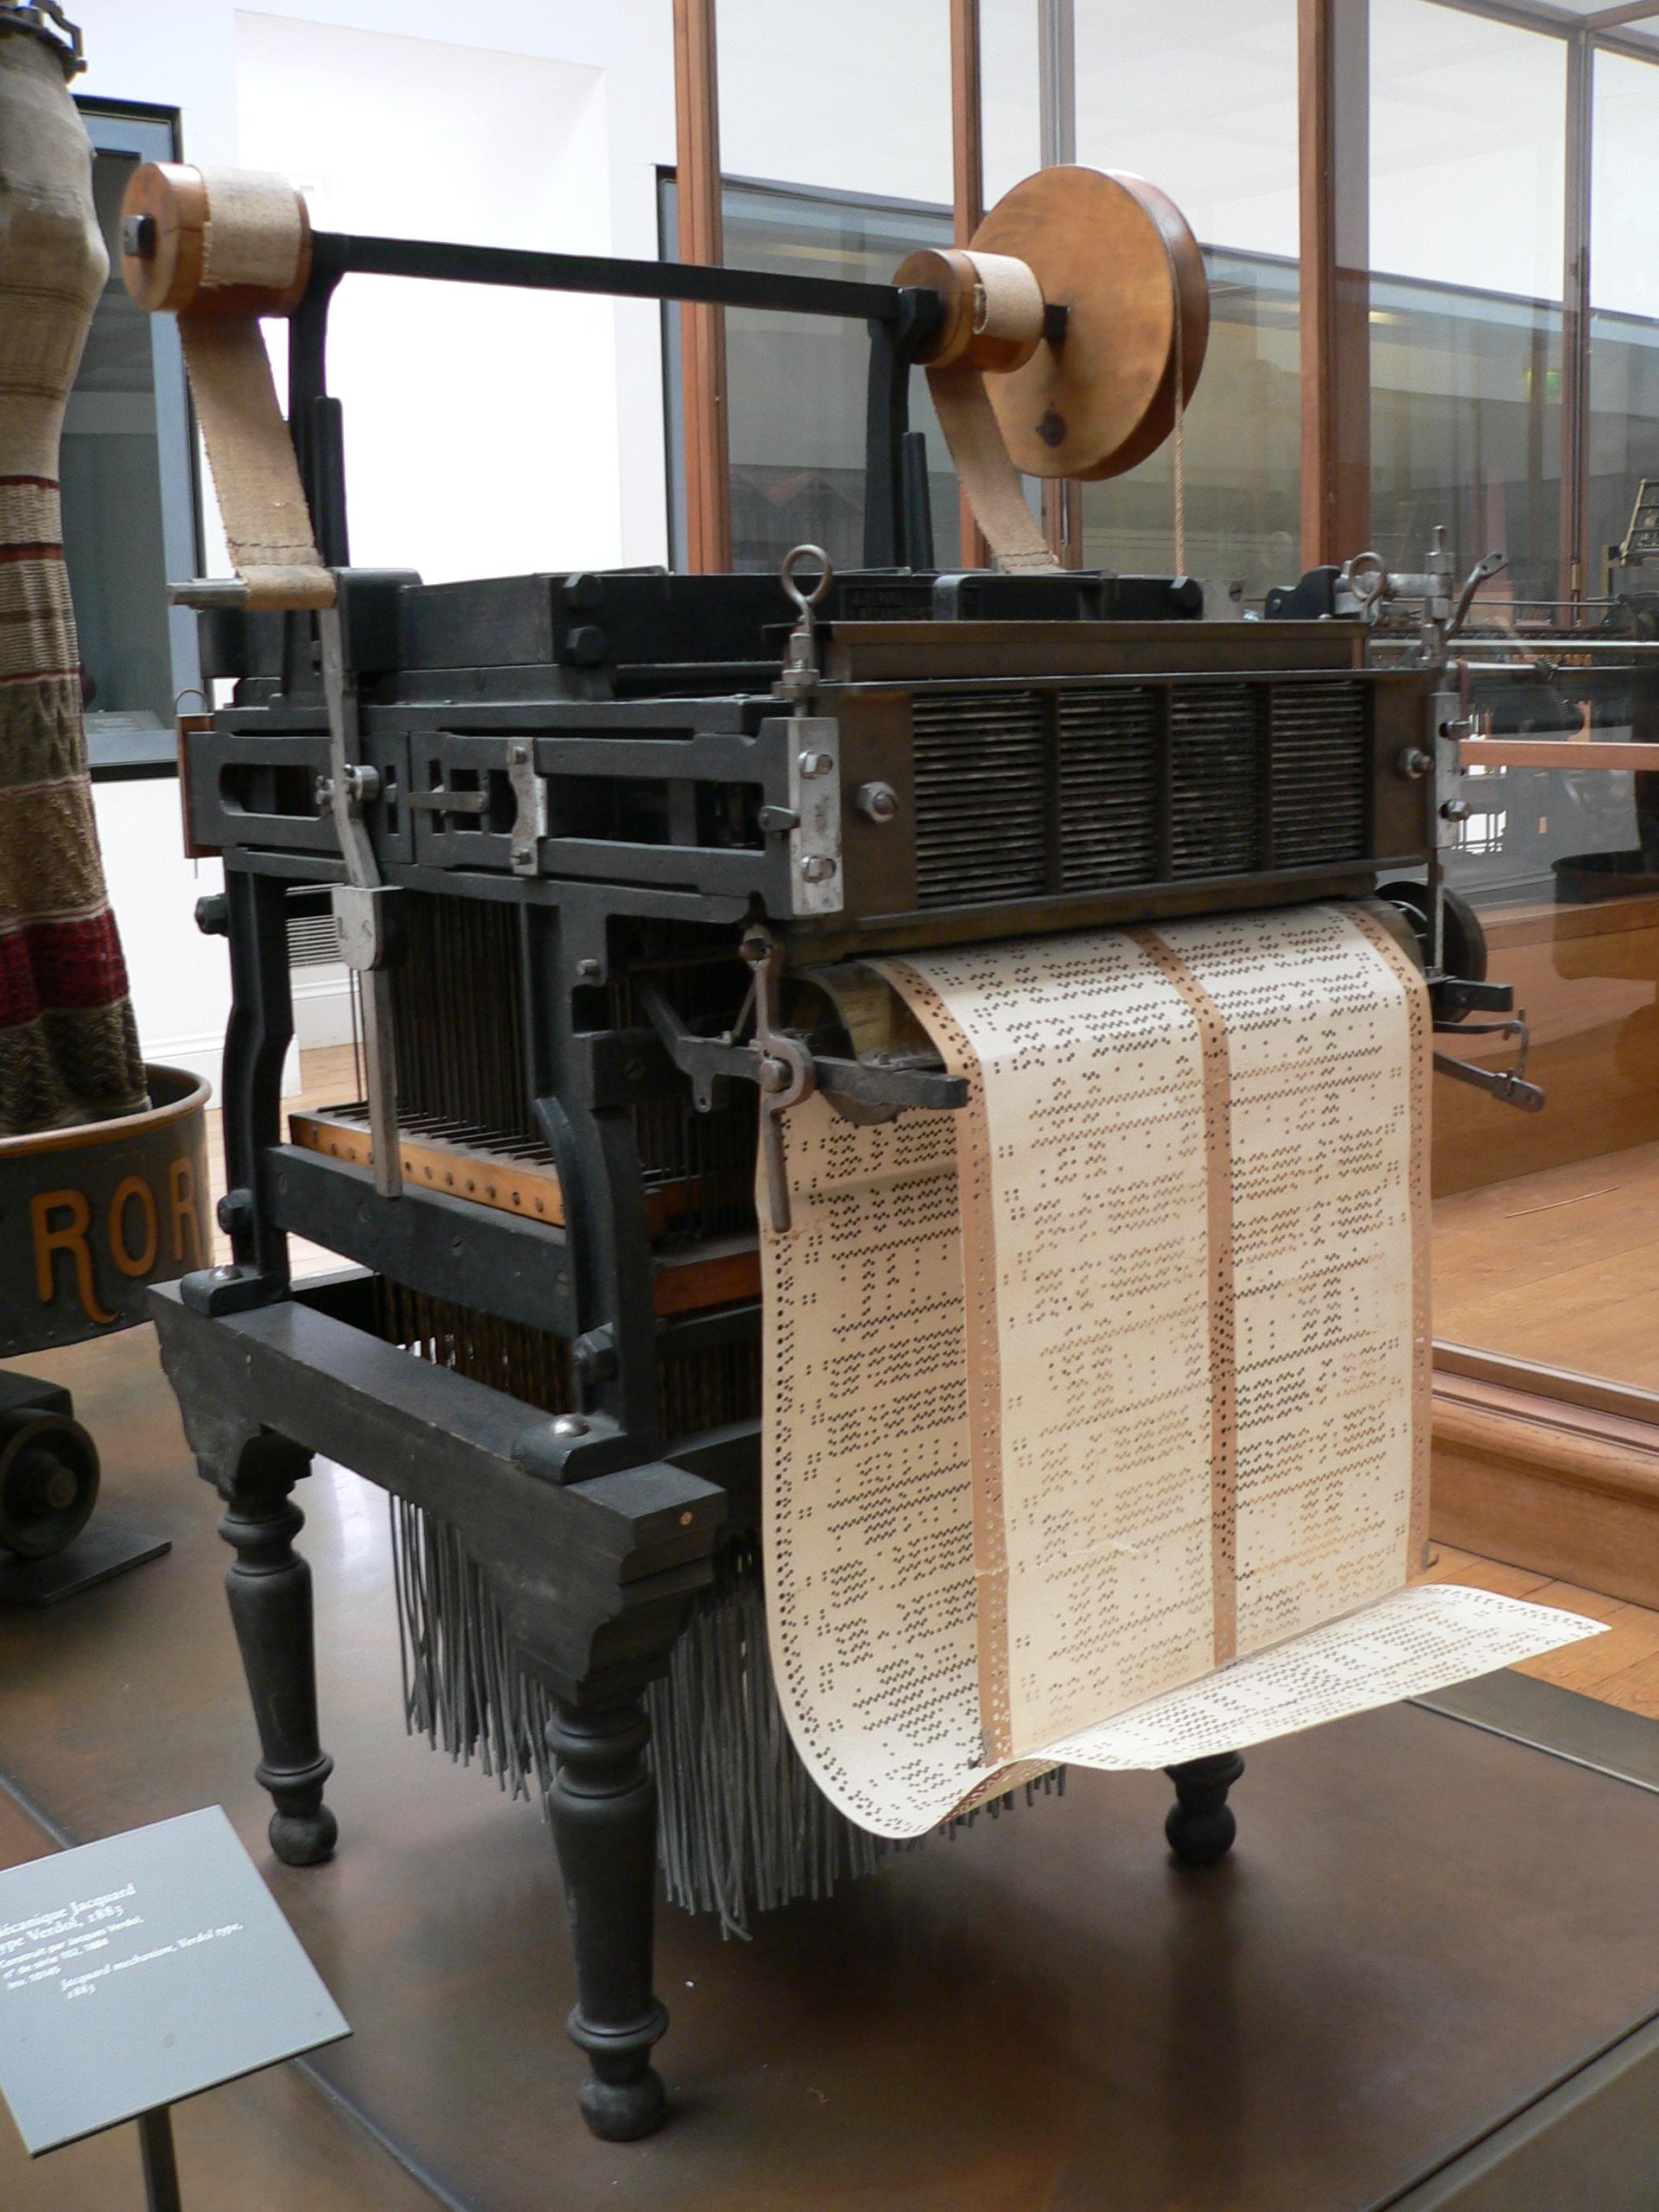 File:Jacquard loom p1040320.jpg - Wikimedia Commons